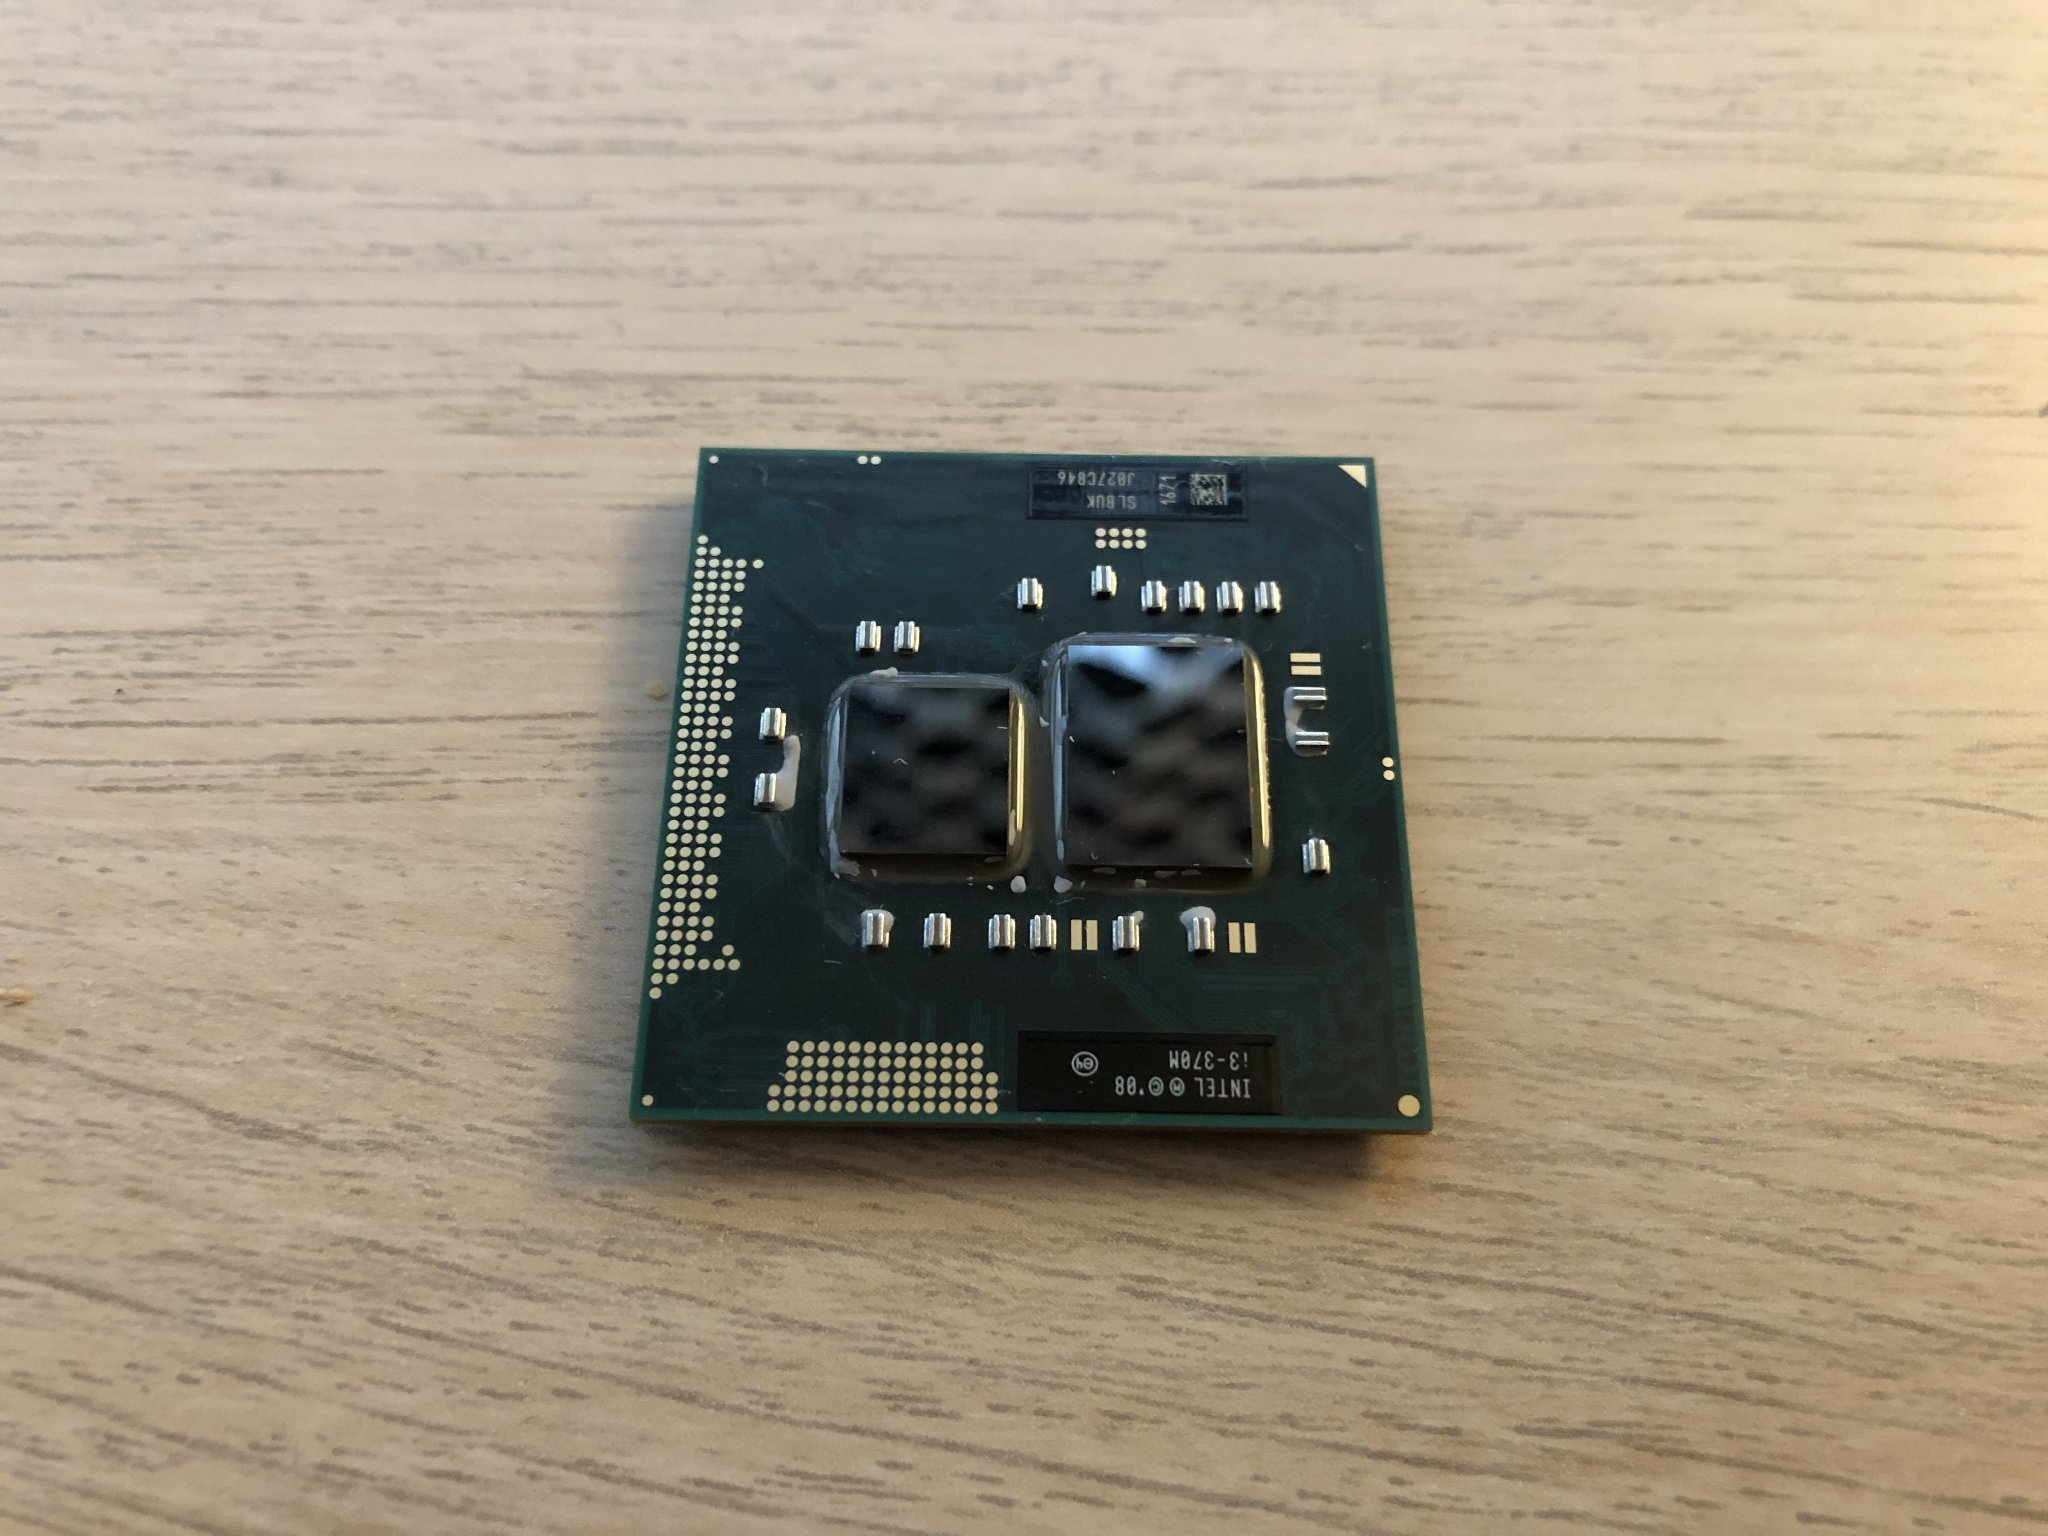 Intel Core i3-370M 3M SLBUK 2 Core Notebook Processor 2.4 GHz